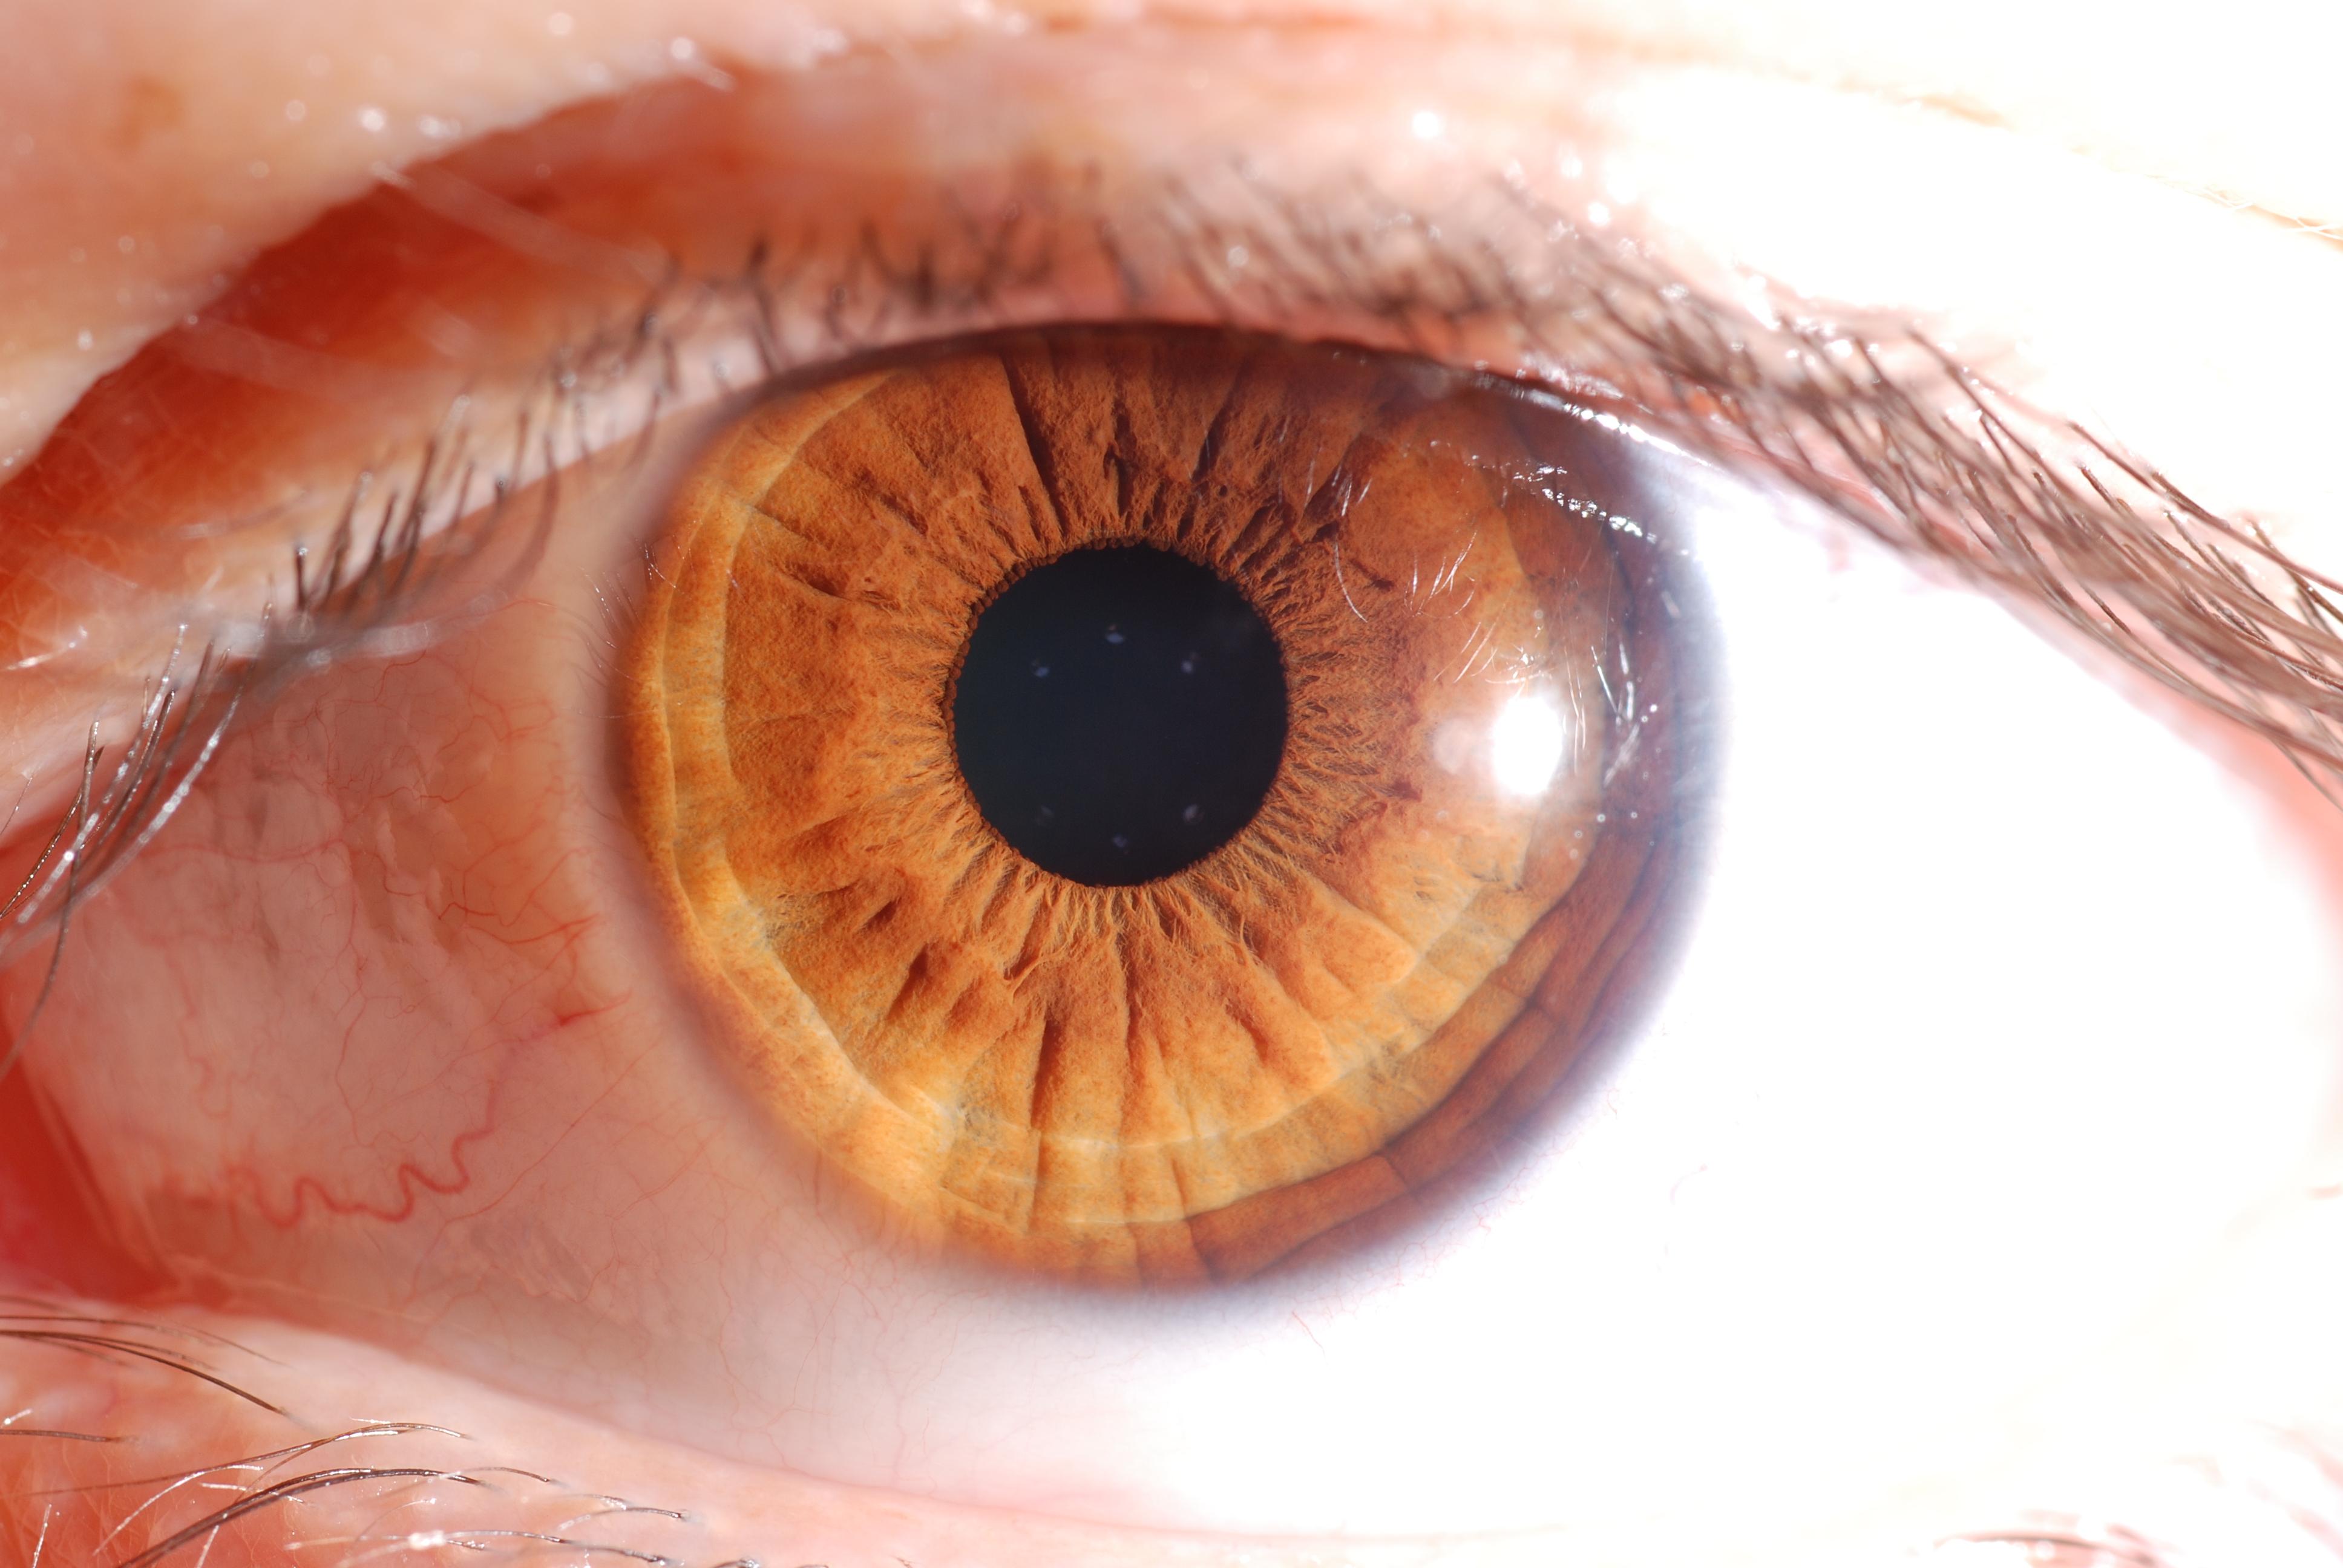 iridologo è un medico?